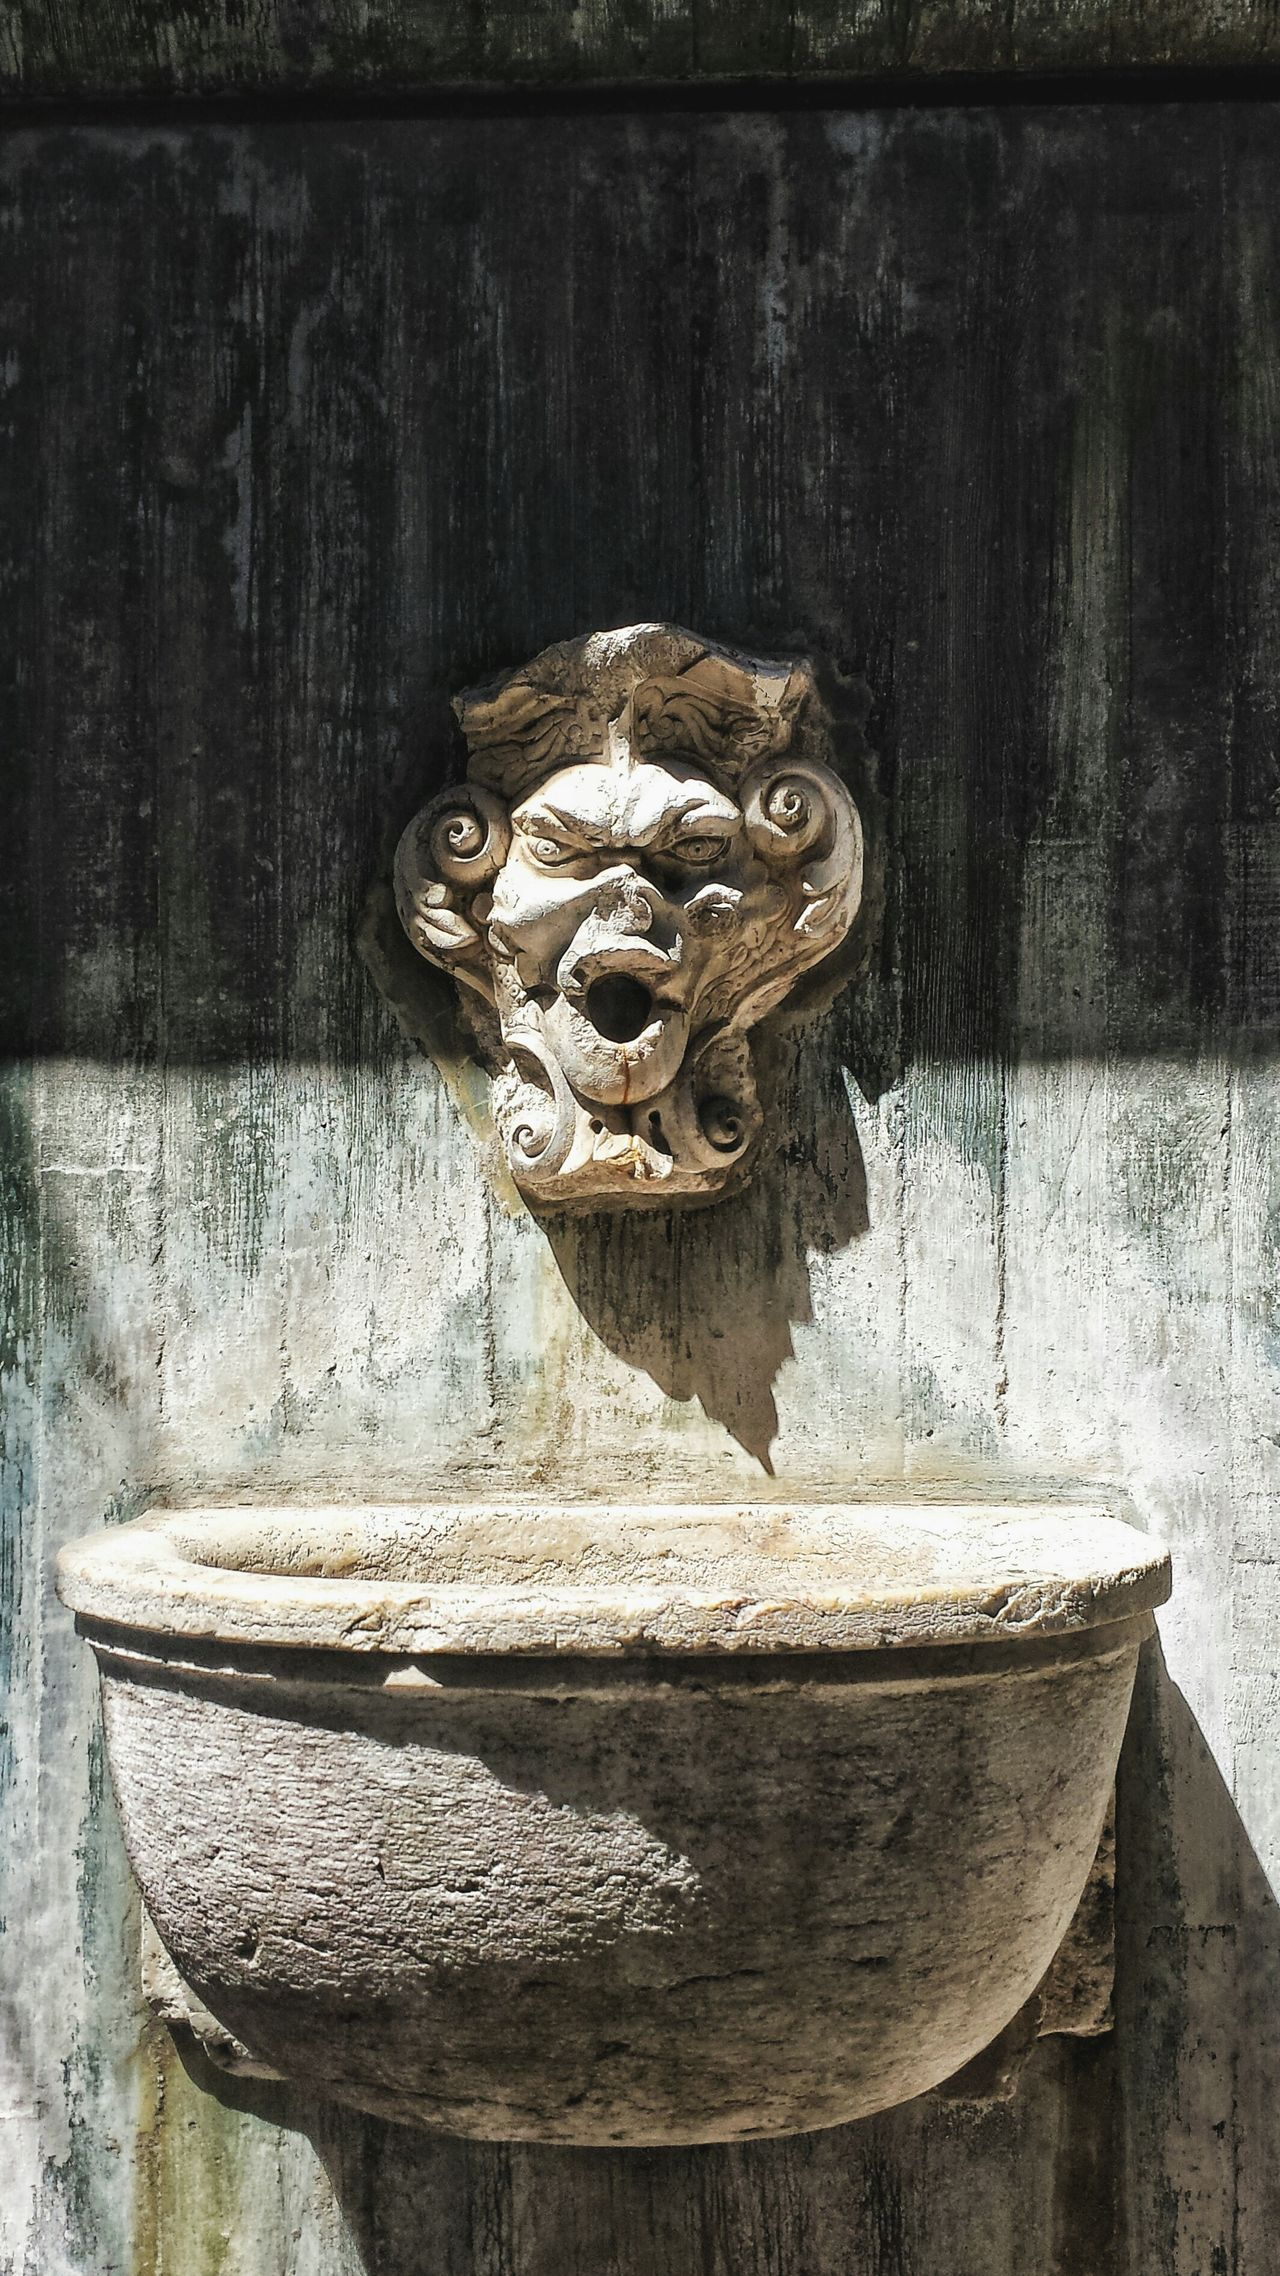 Fountain Sink Gargoyle São Jorge Sao Jorge Castle Lisboa Lisbon Portugal